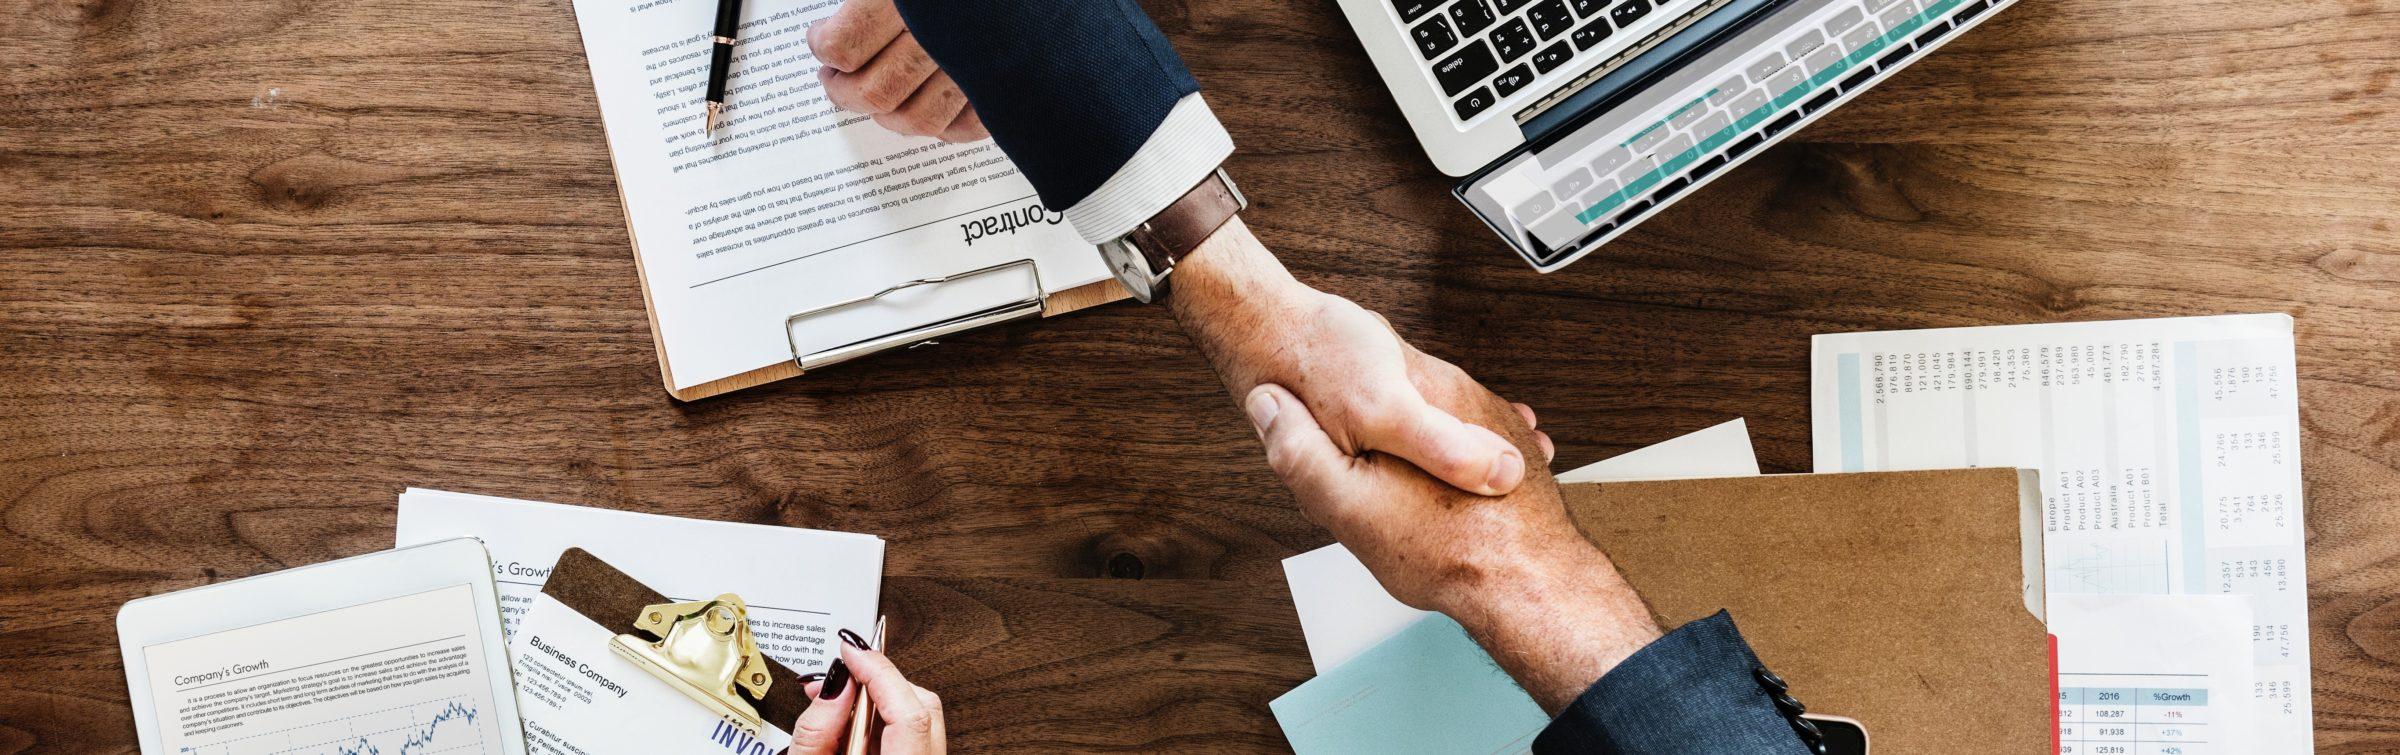 agreement-business-businessman-872957 (2)